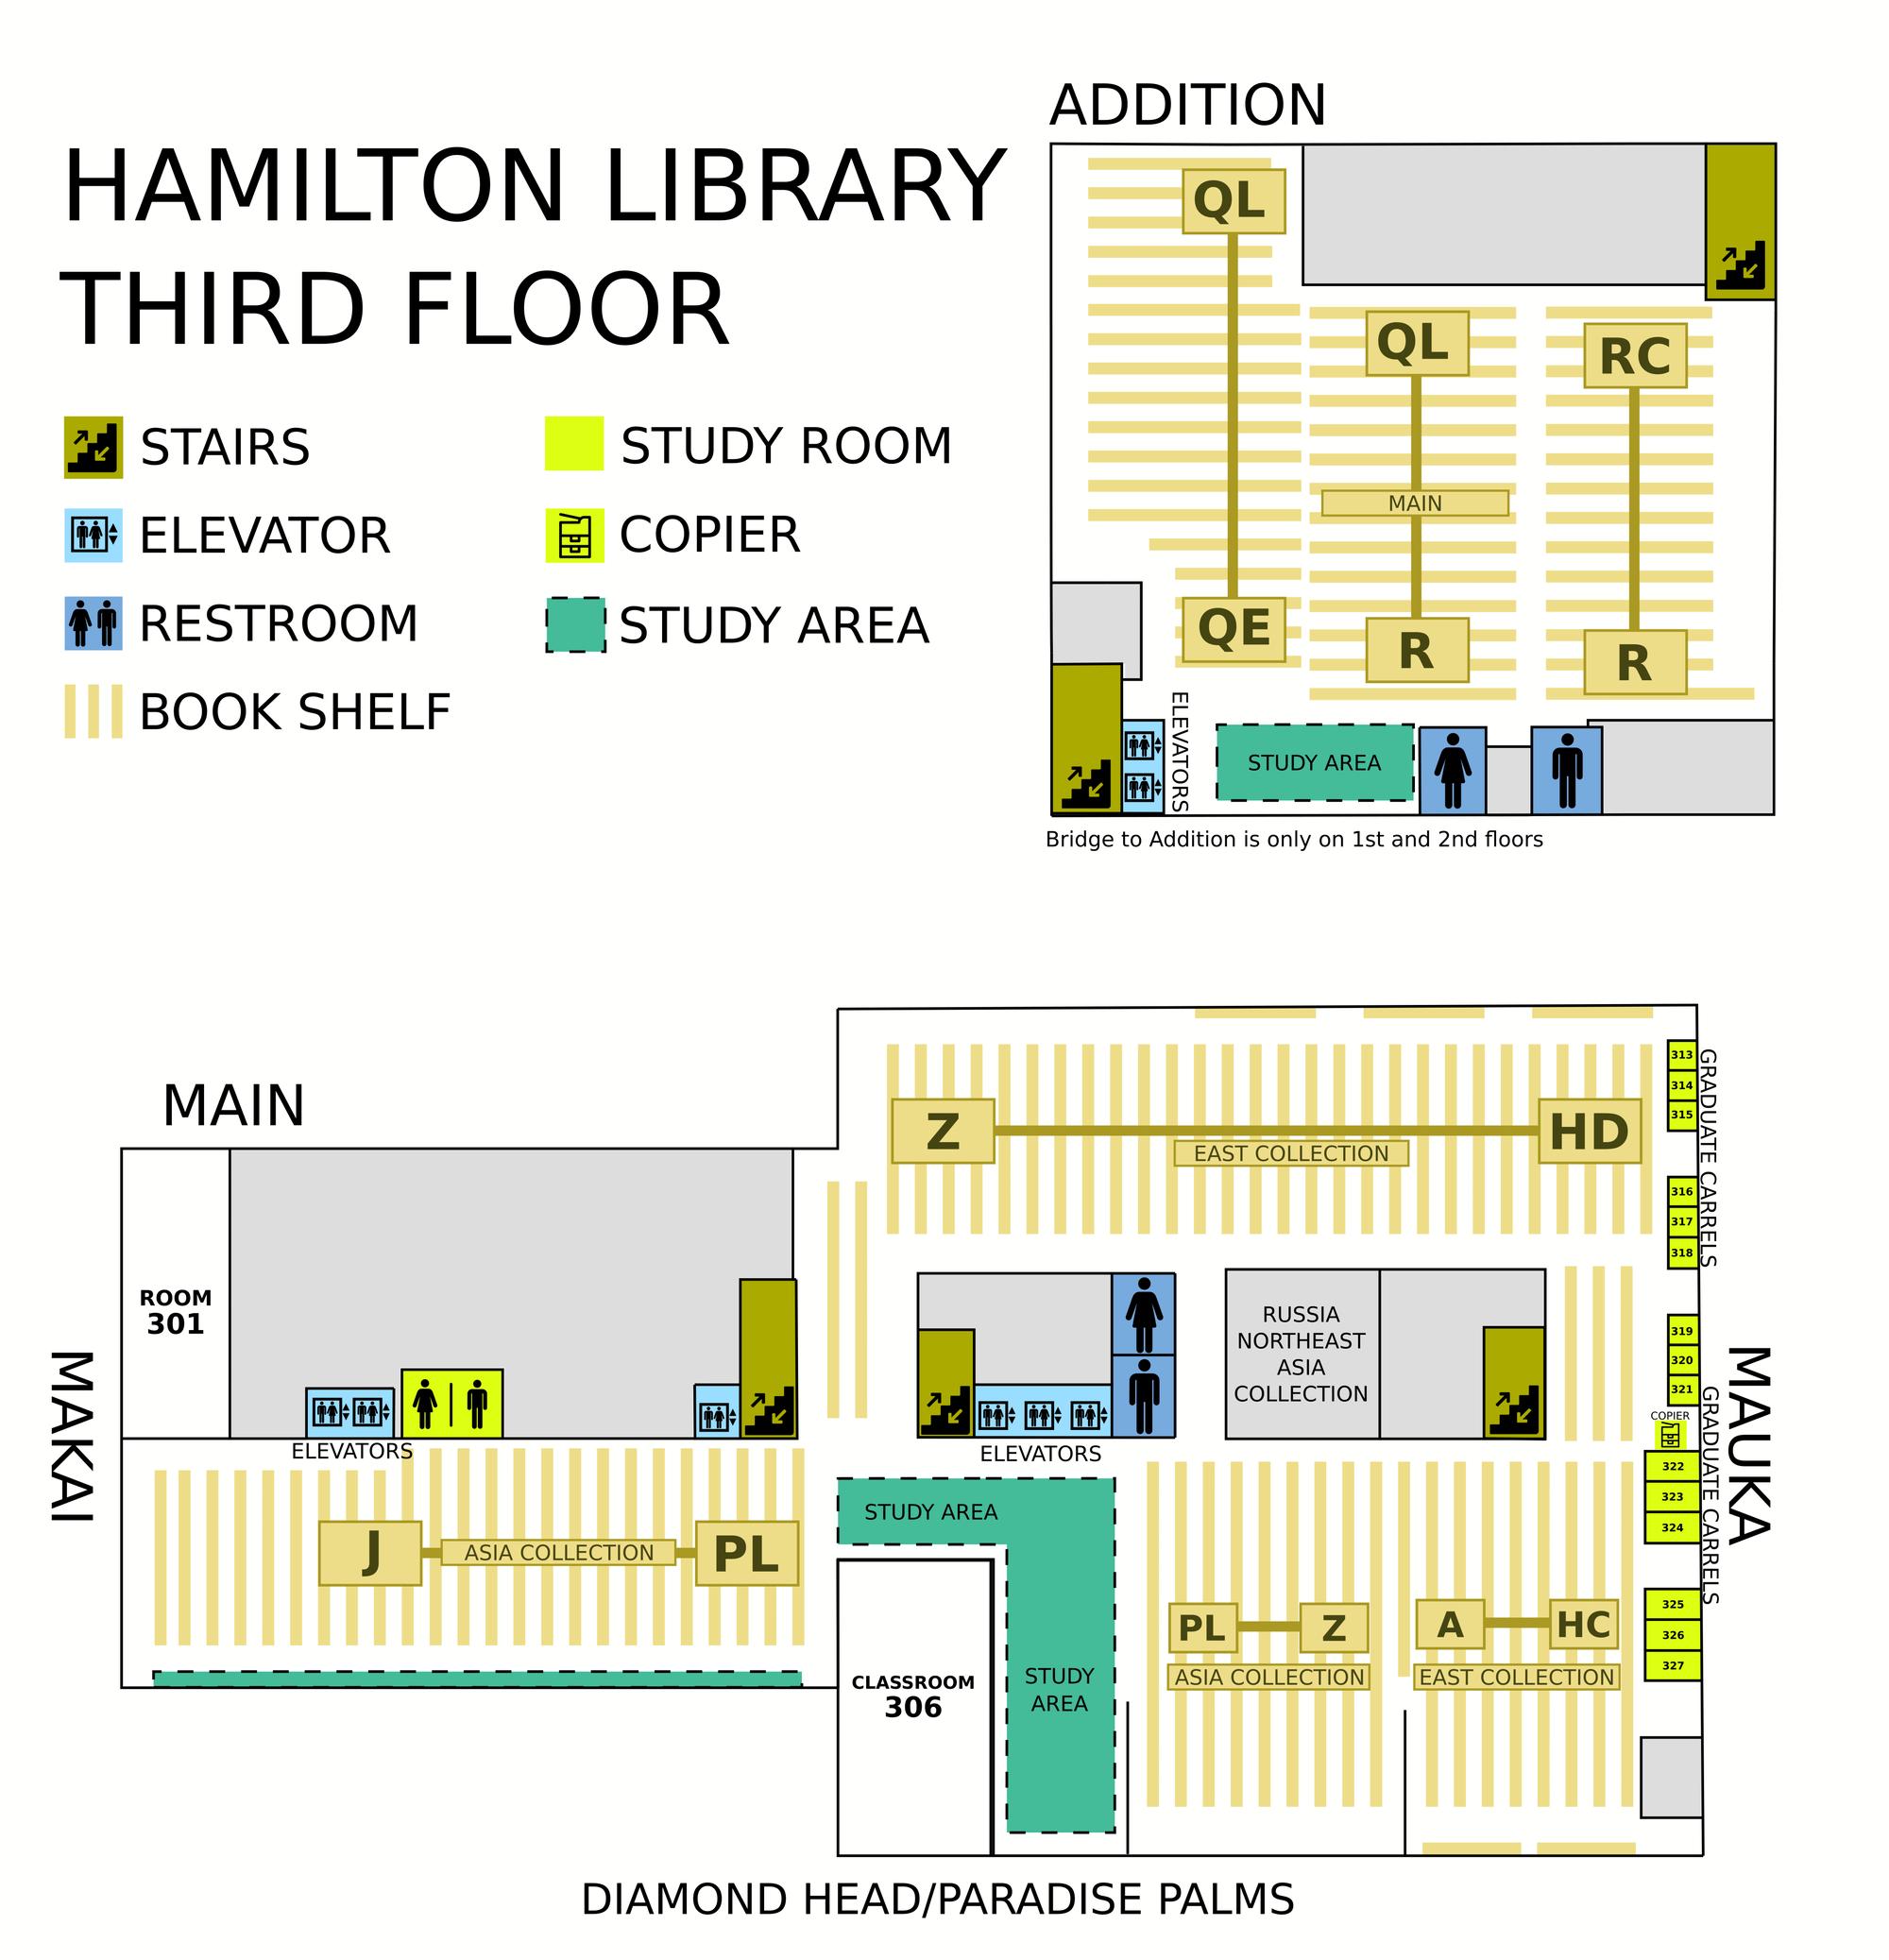 Hamilton third floor map